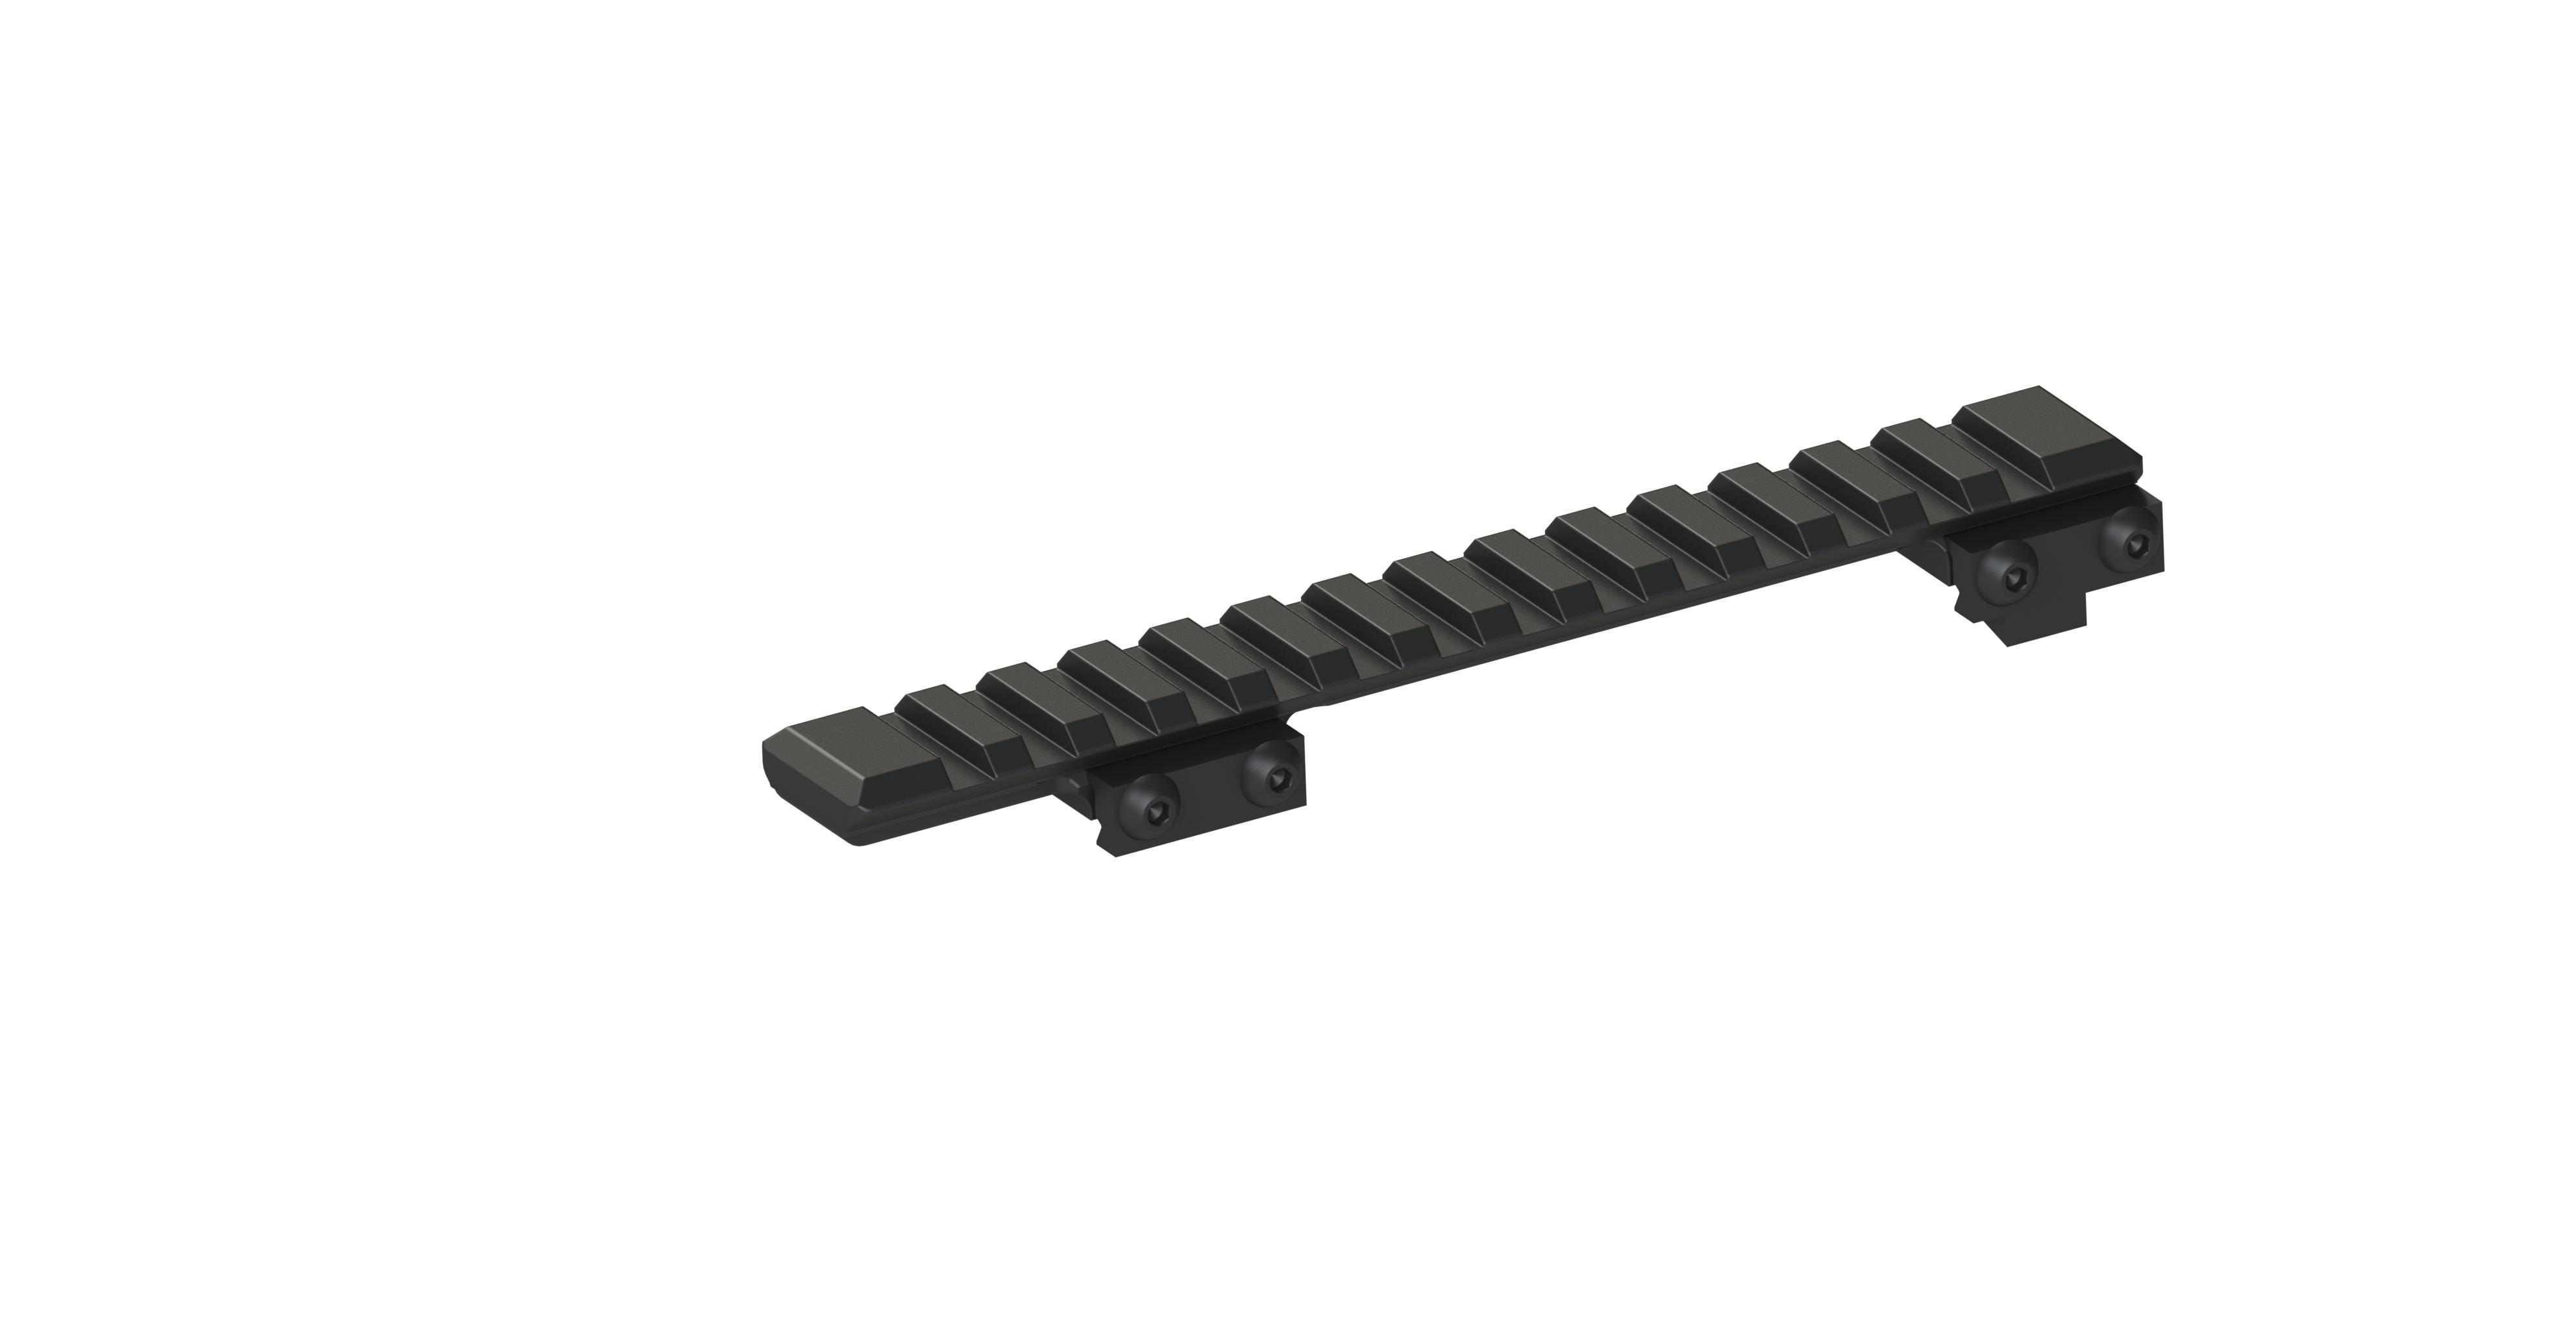 Recknagel Picatinny Schiene CZ - 550 / 557 Medium